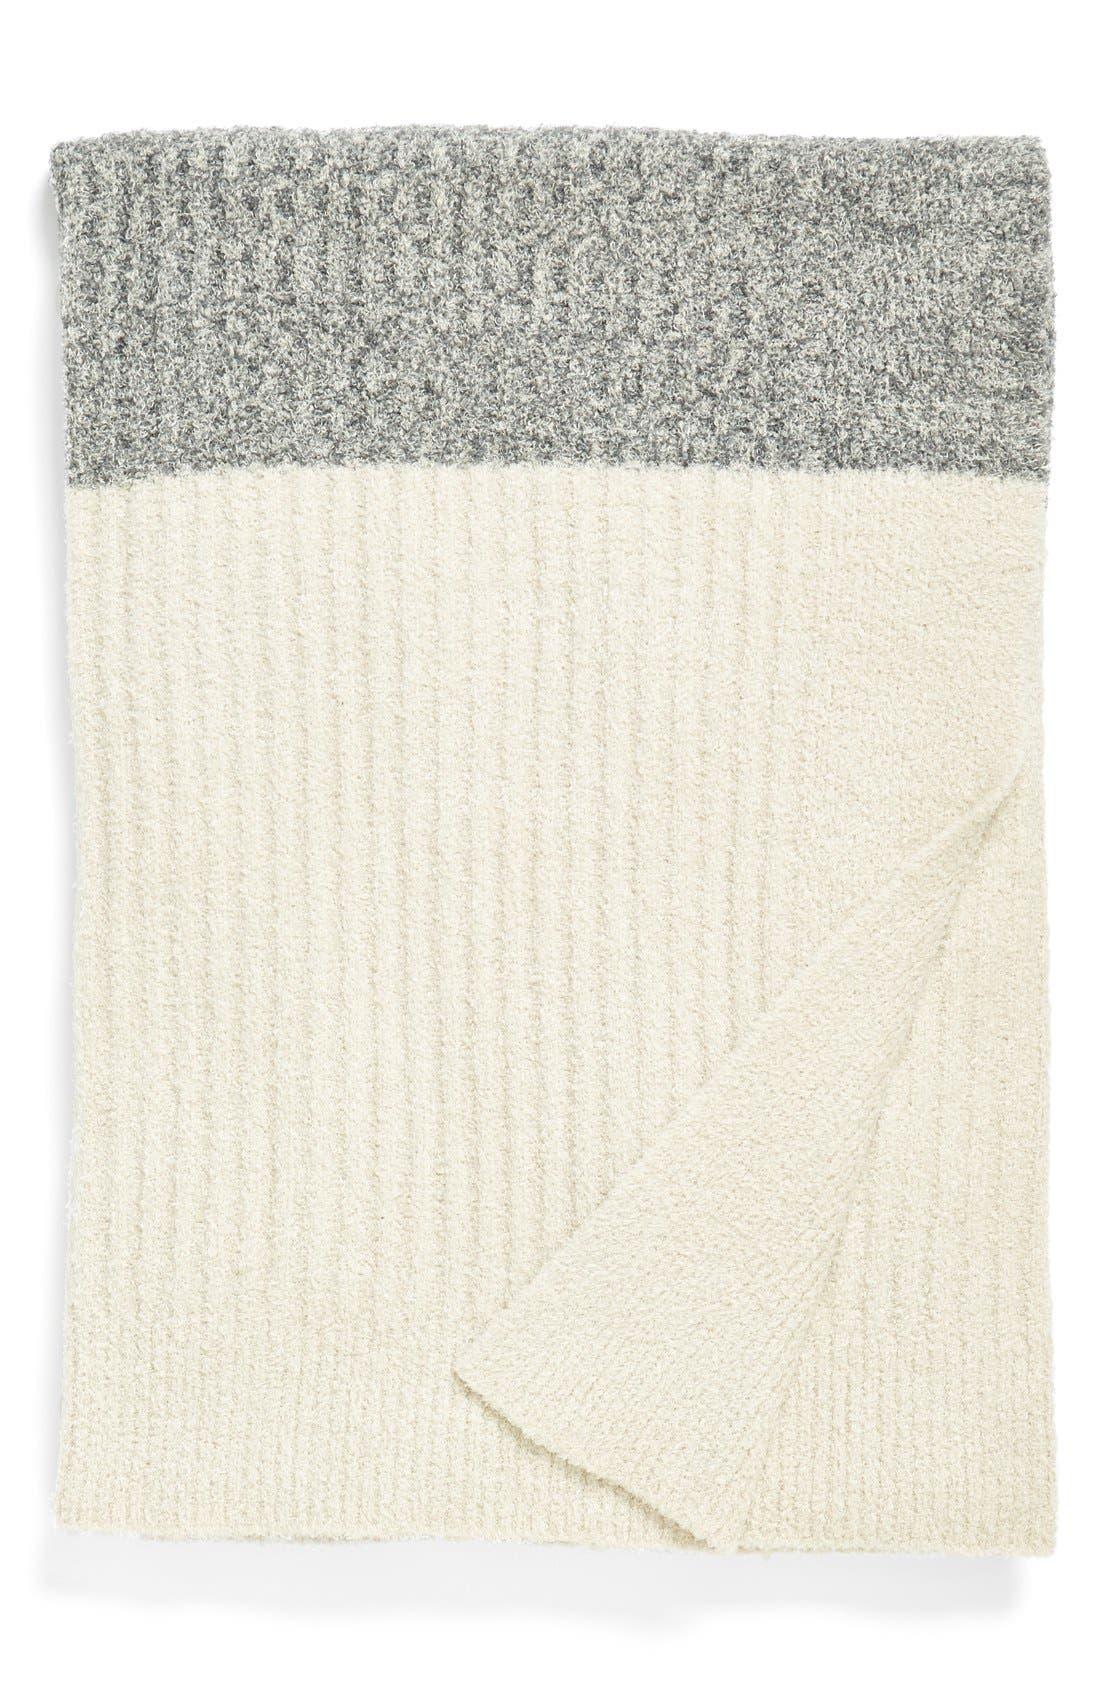 Alternate Image 1 Selected - Barefoot Dreams® Heathered Stripe Throw